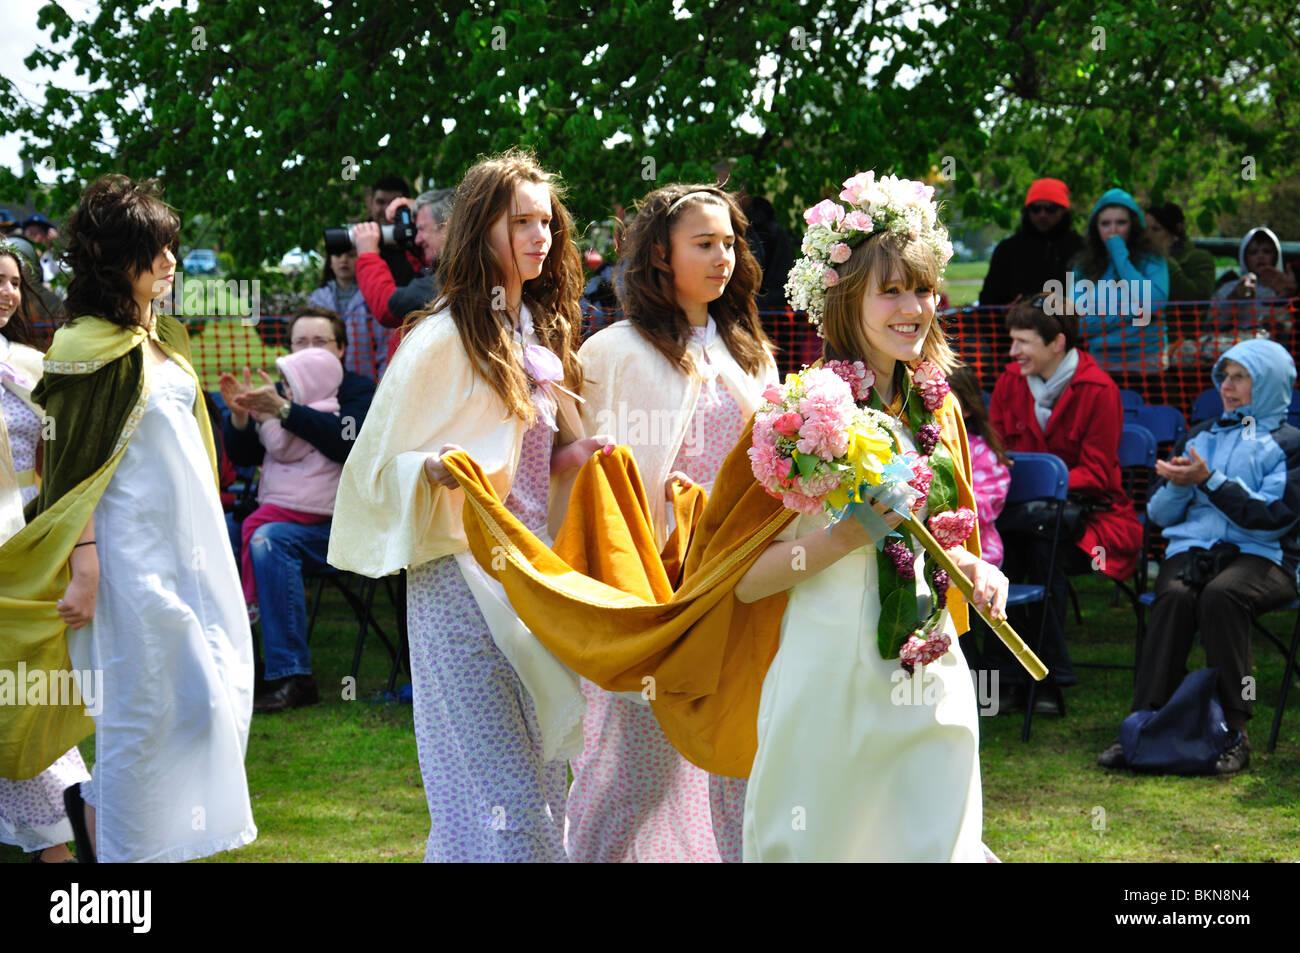 fort shafter girls Shop snowybridal for cheap flower girl dresses for girls in white or ivory, tutu blue flower girl dresses and first communion dress for wedding.